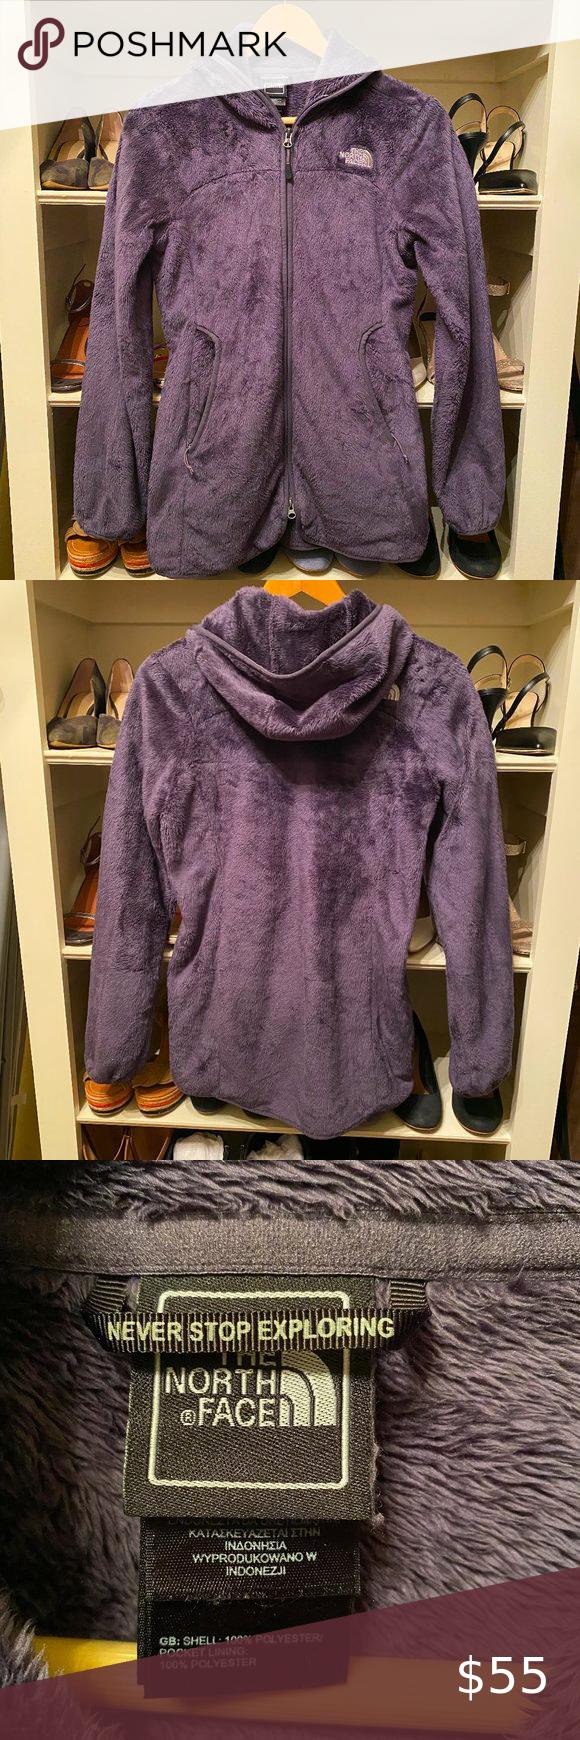 North Face Osito Hoodie Full Zip Purple Jacket S Purple Jacket Full Zip Hoodie Jackets [ 1740 x 580 Pixel ]